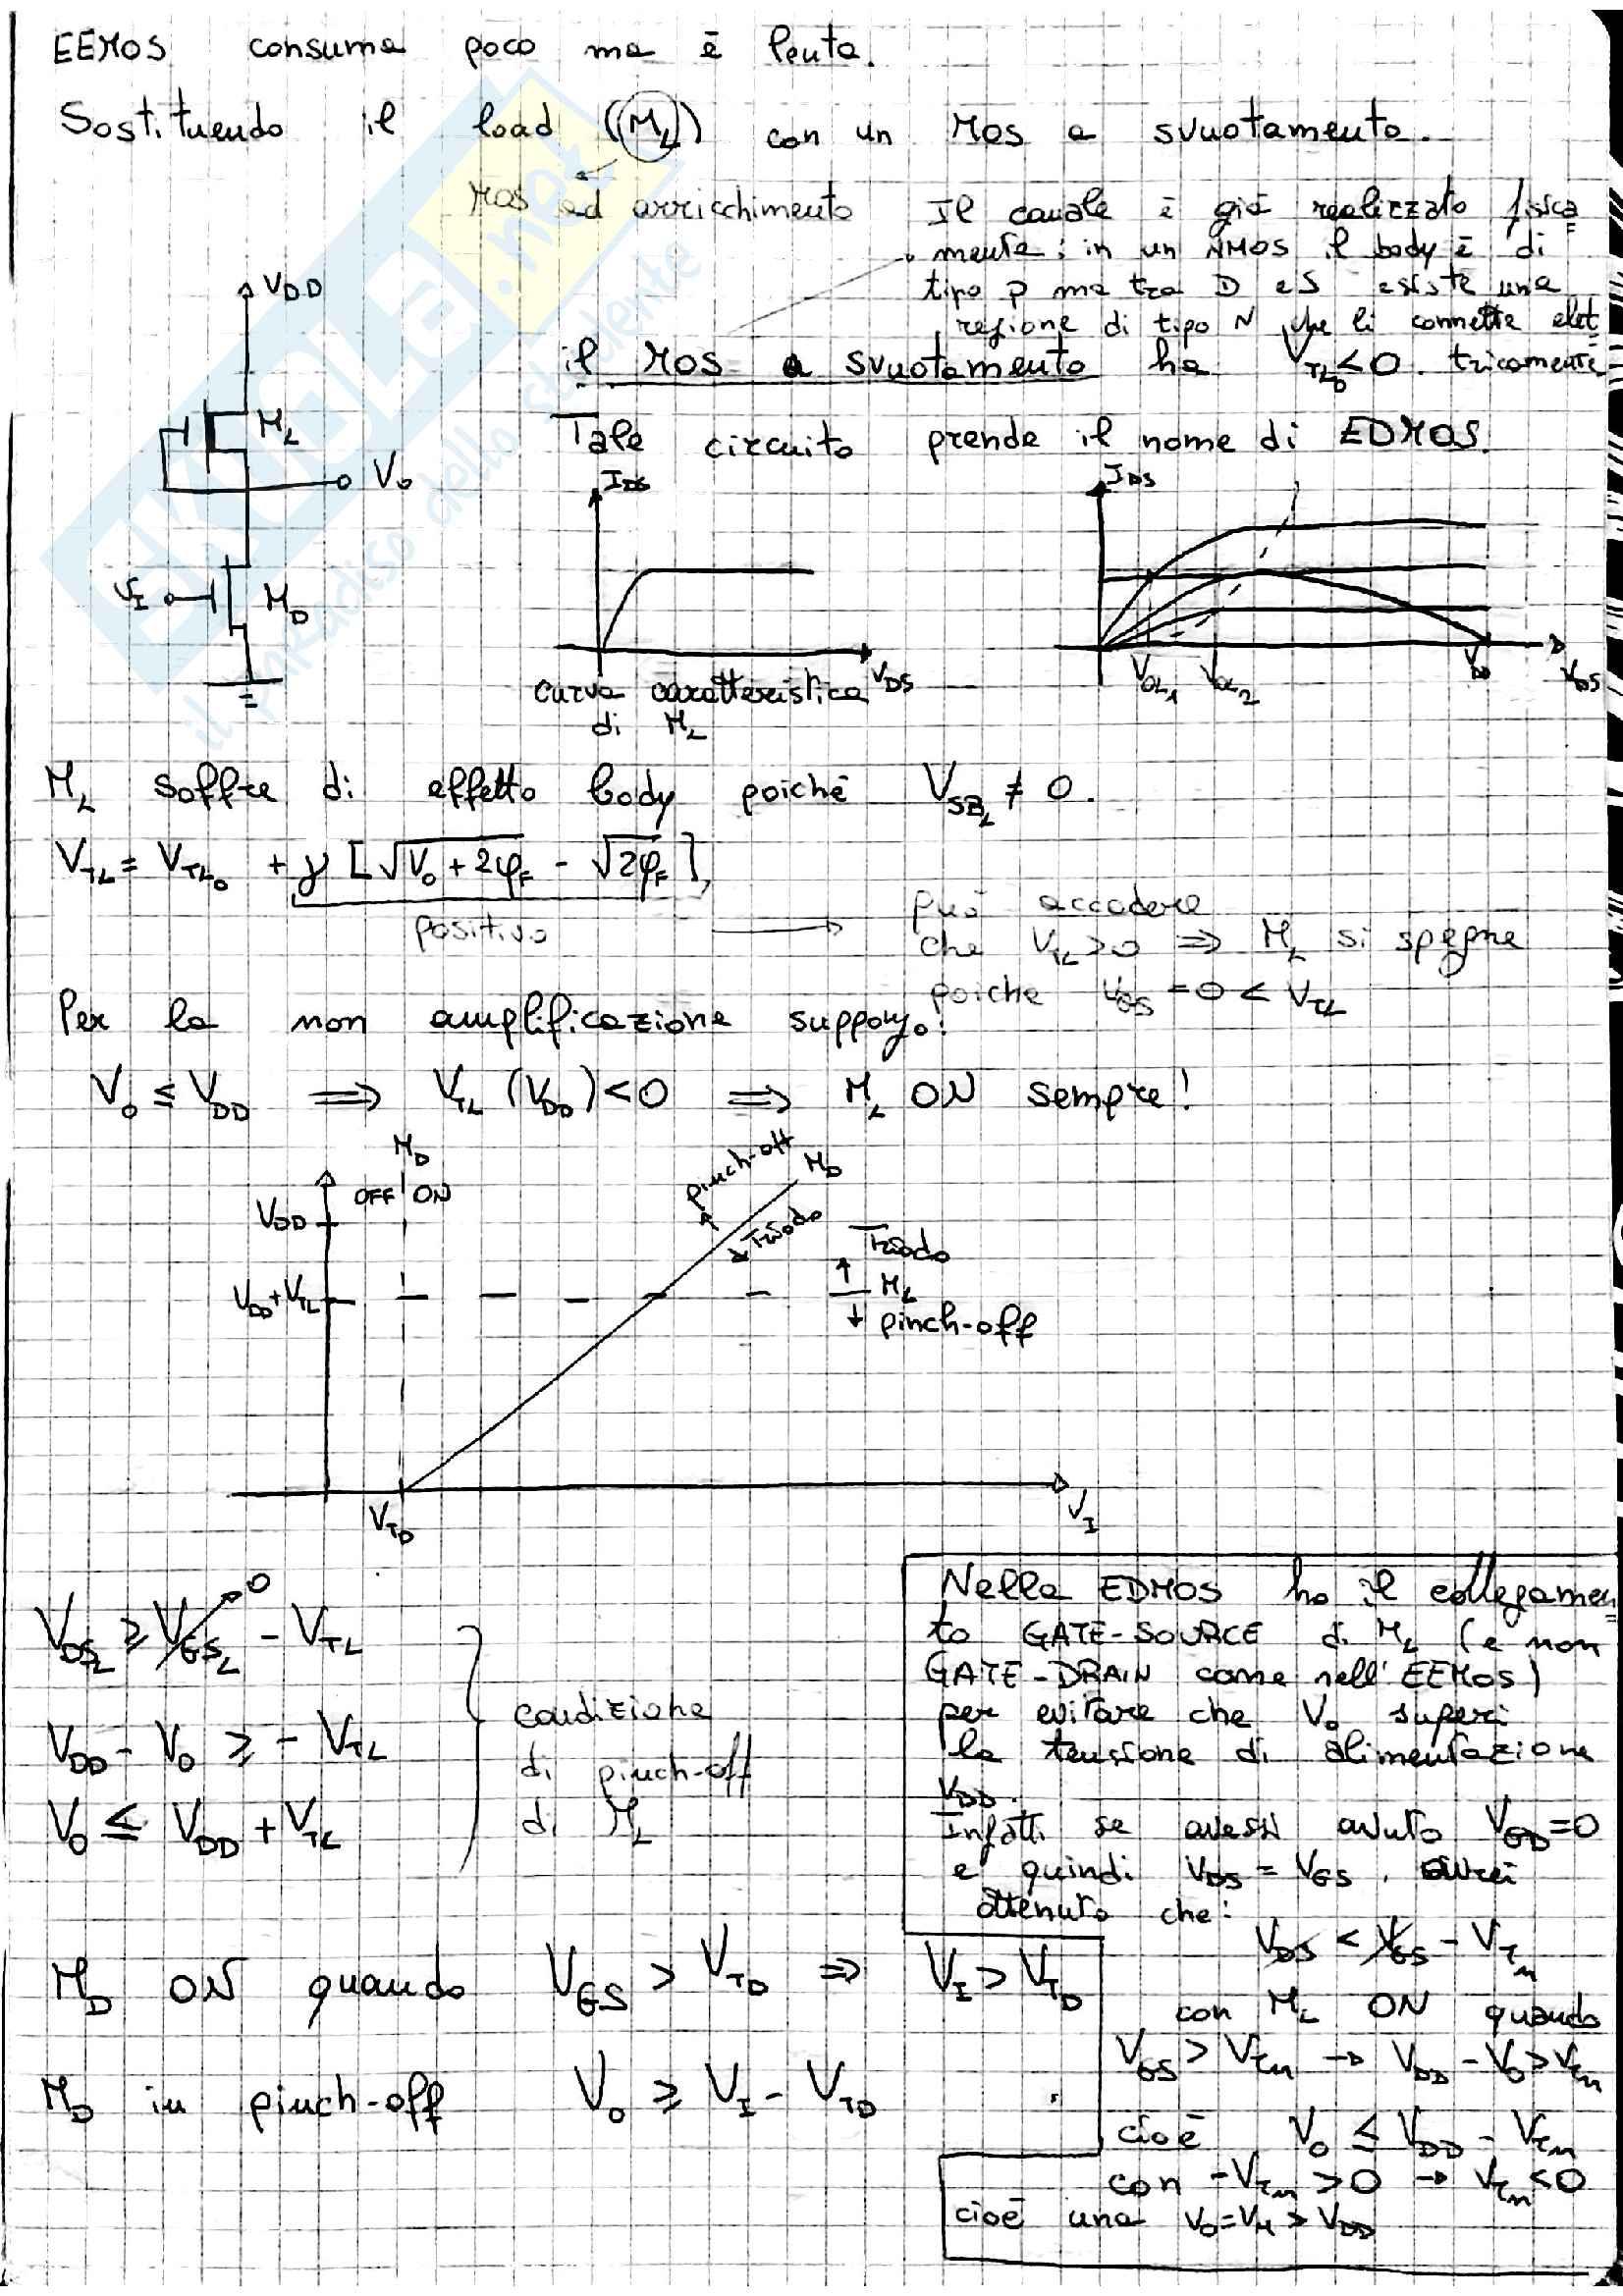 Appunti ED:EDMOS+Circuiti logici CMOS FCMOS, parte II